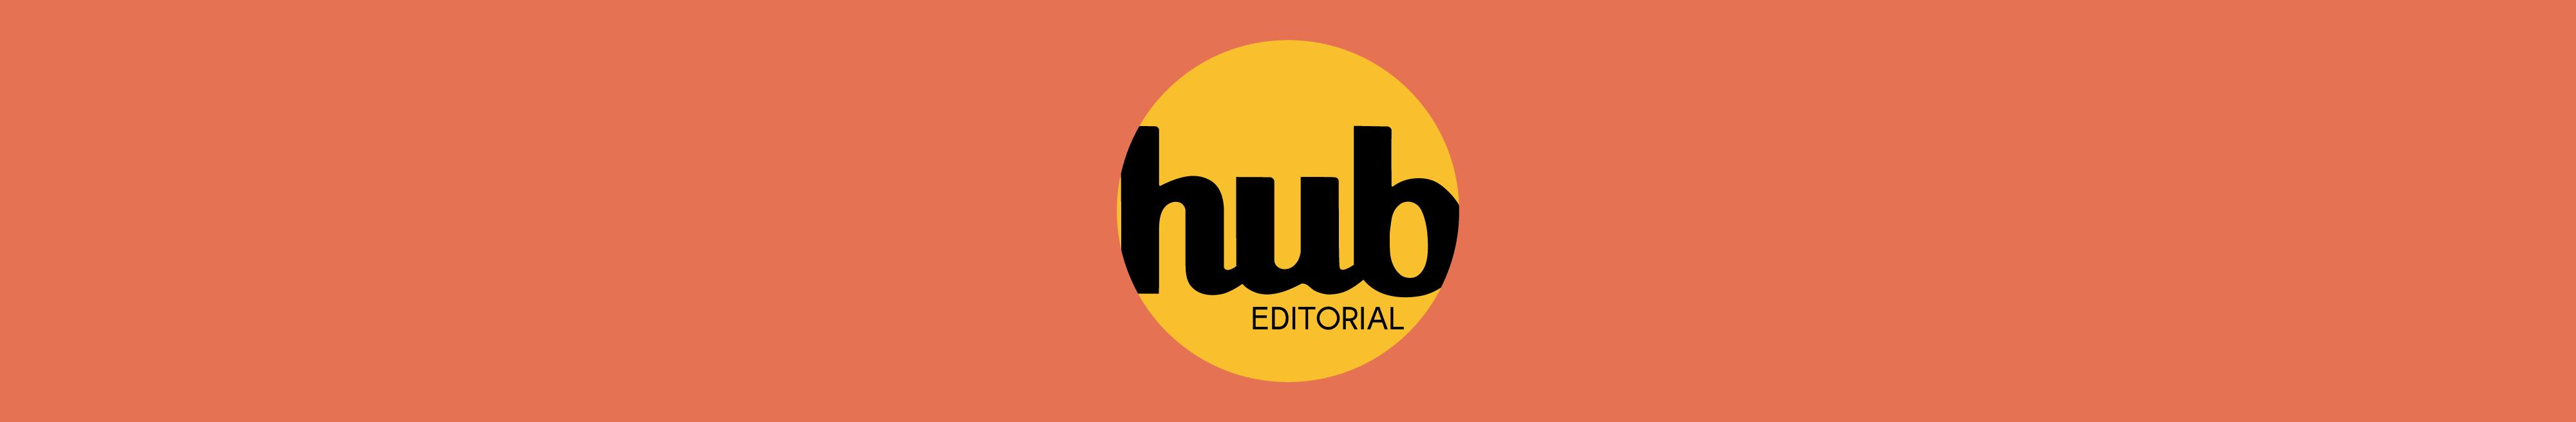 Editorial Hub